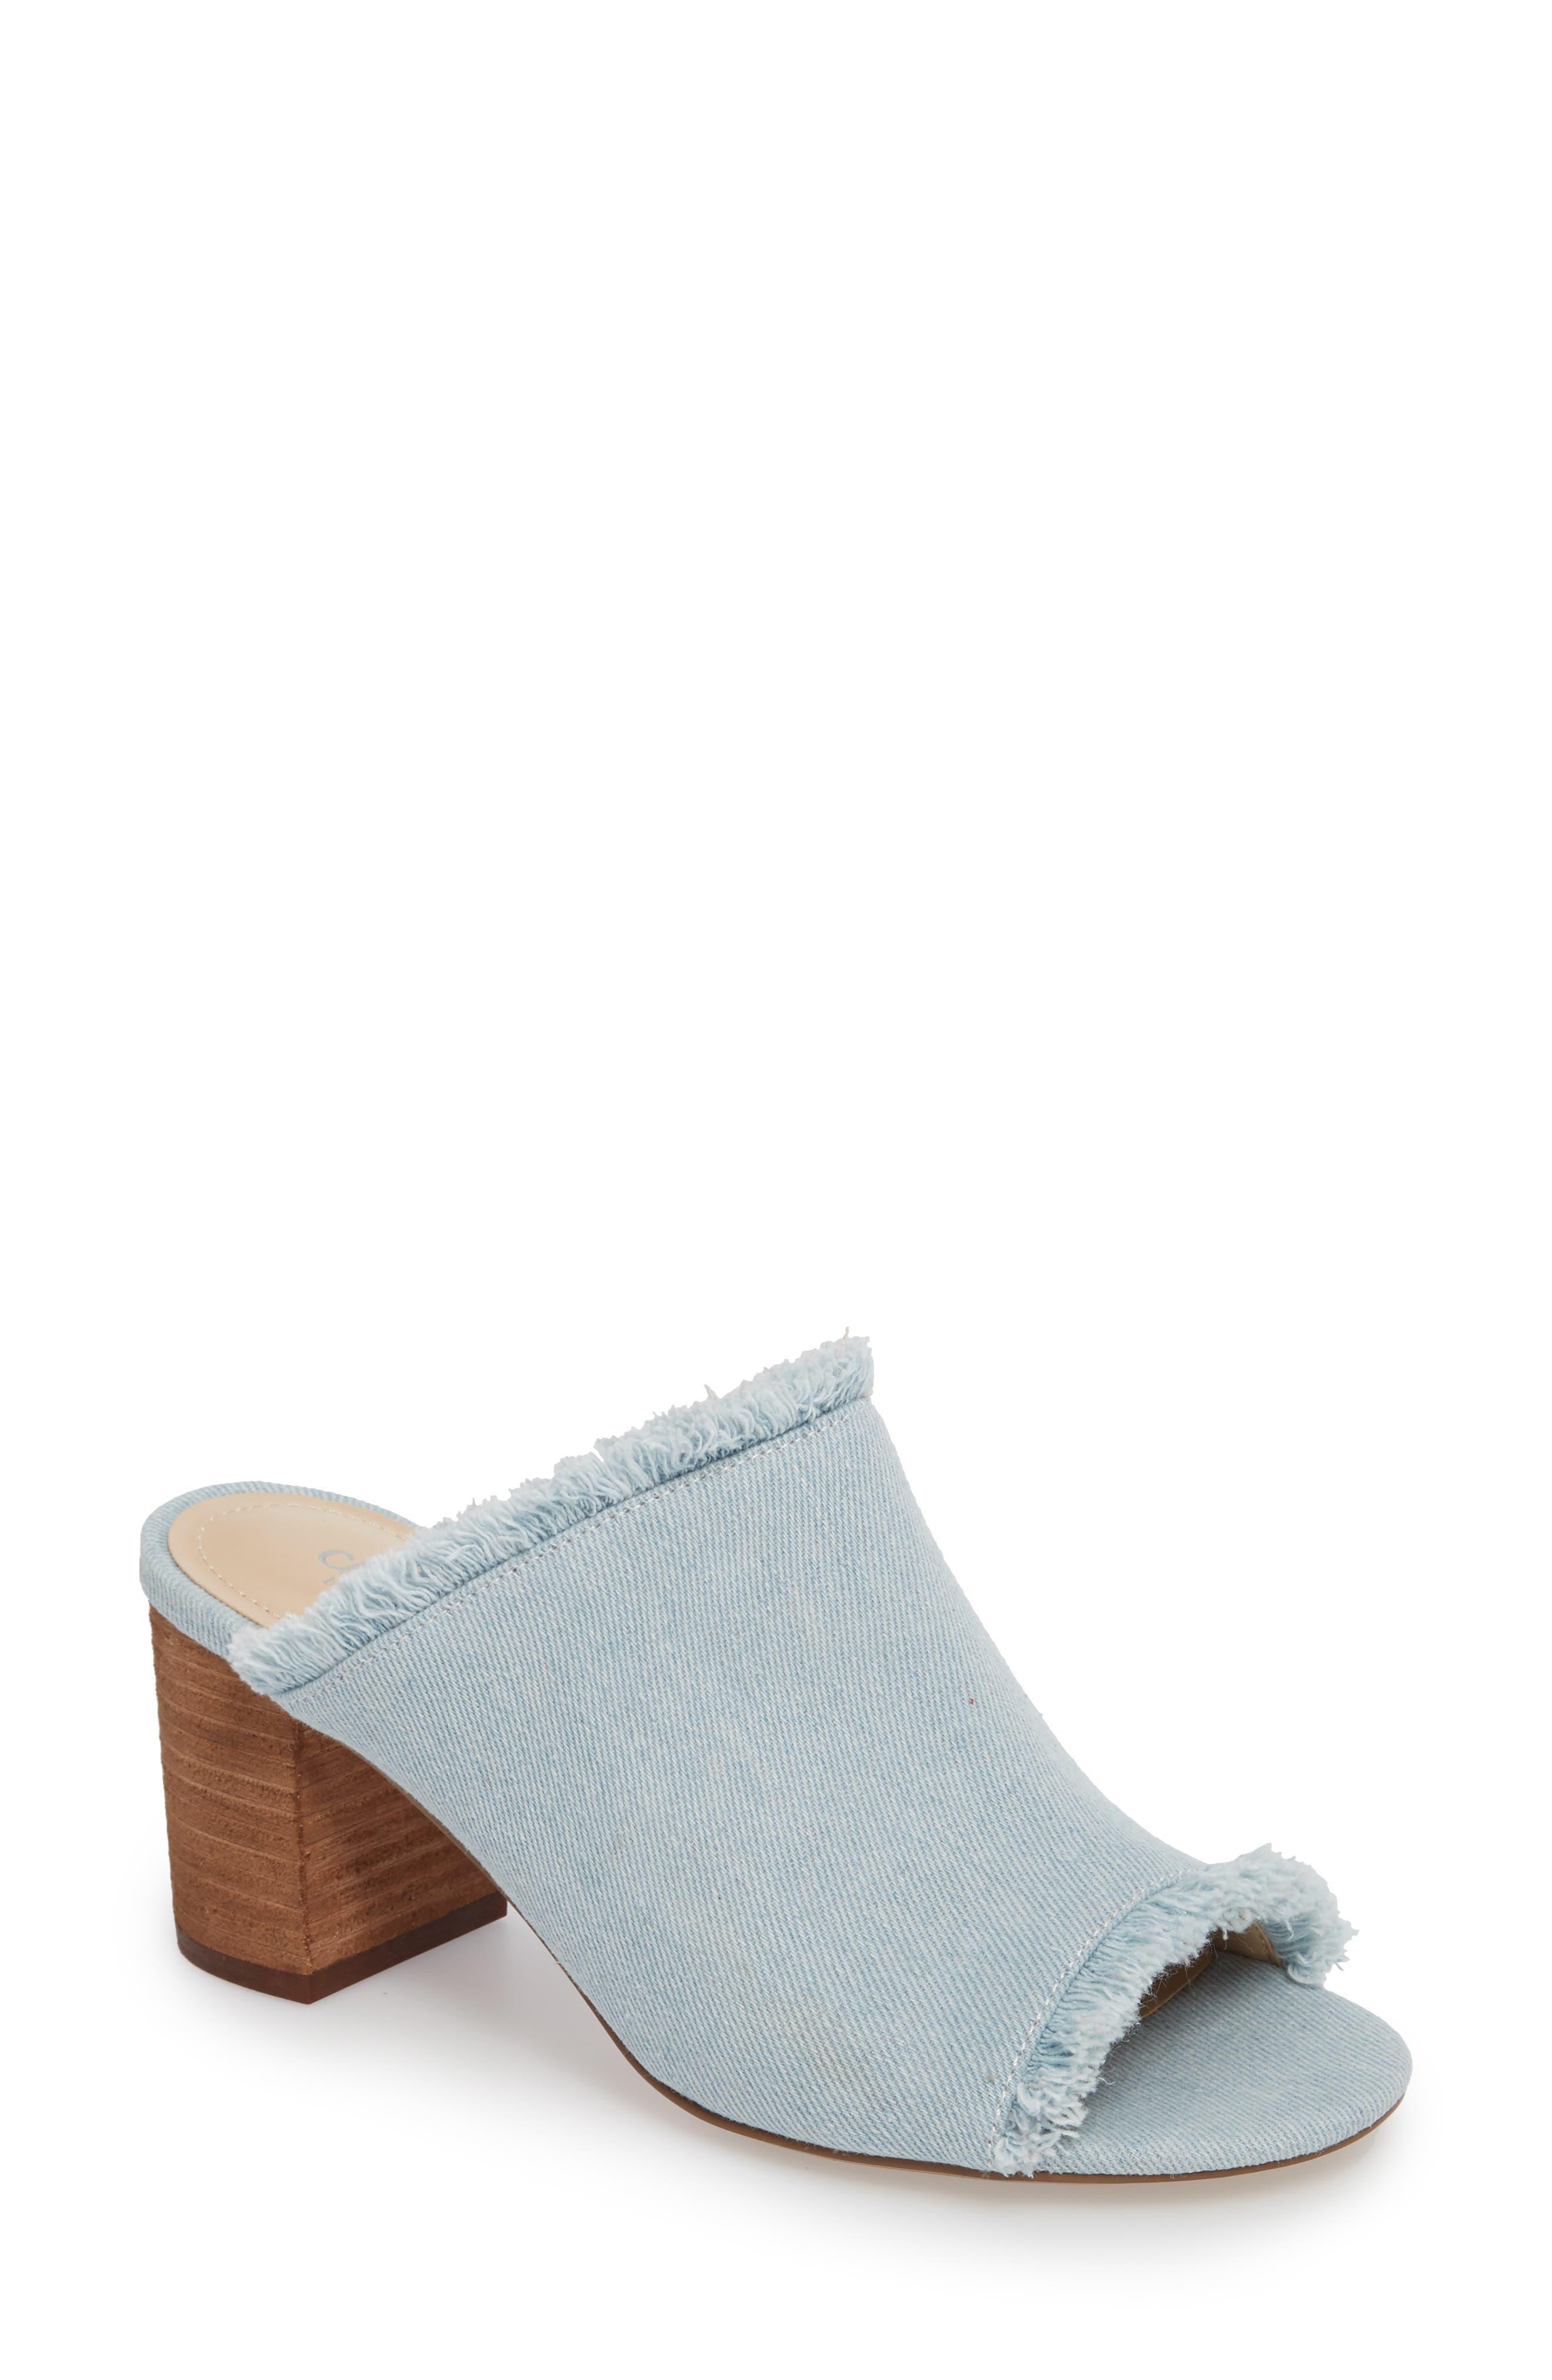 Kadia Fringed Mule Sandal,                             Main thumbnail 3, color,